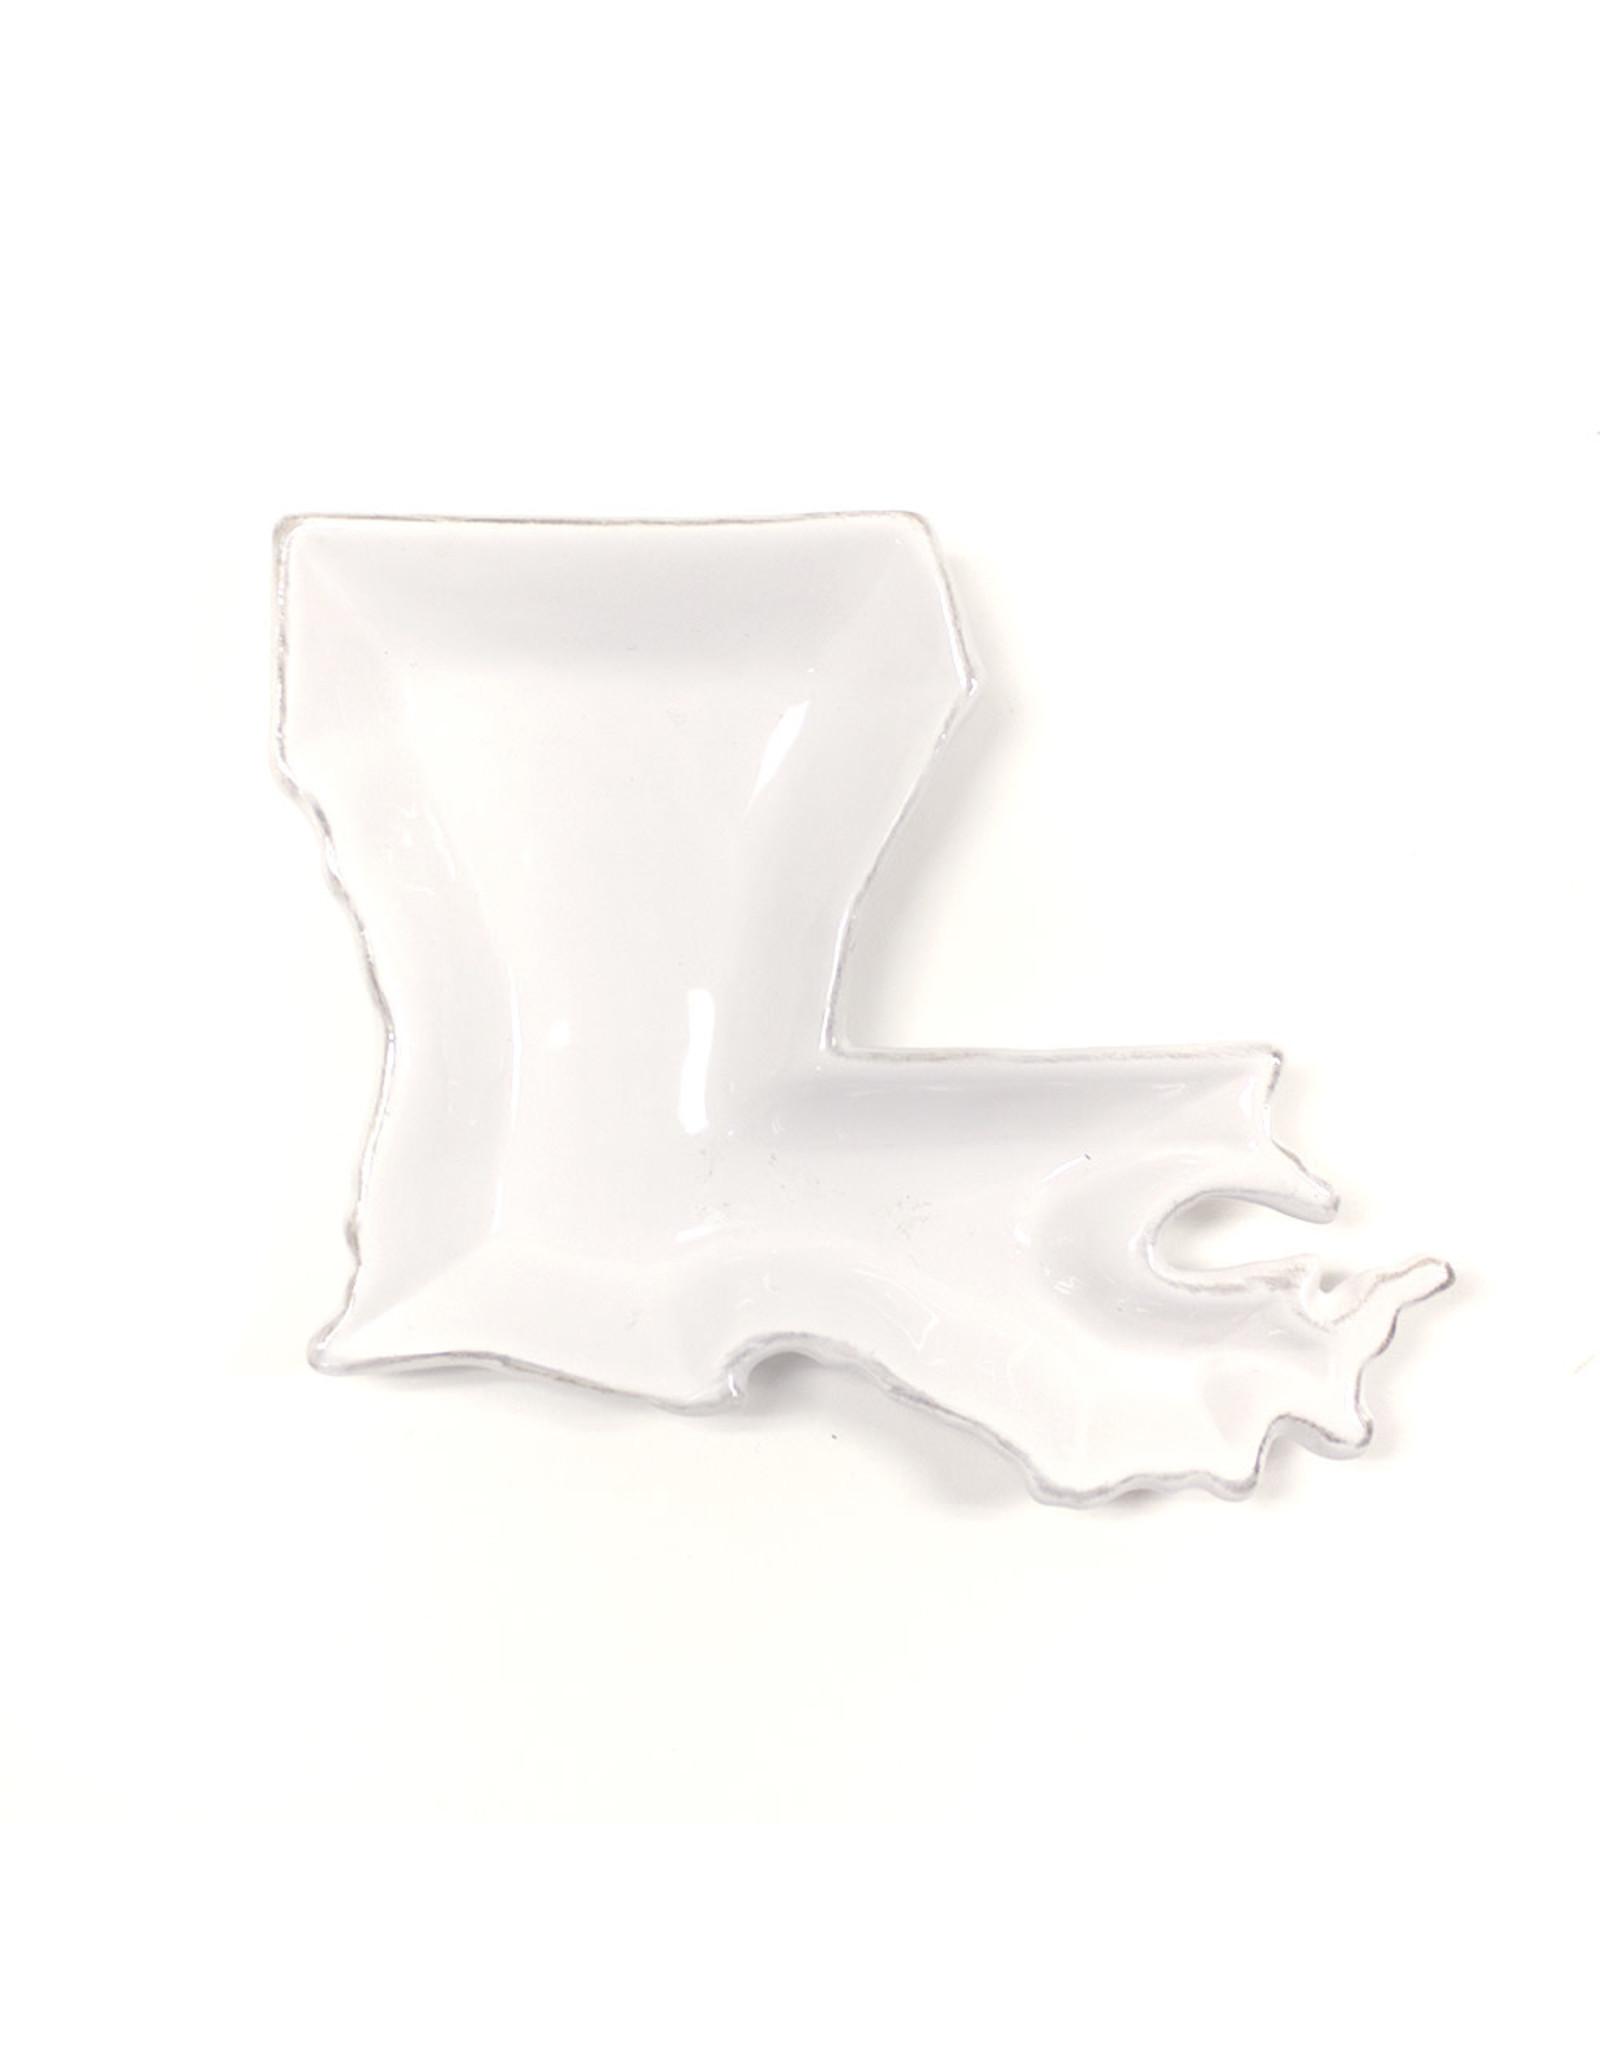 The Royal Standard Louisiana Tidbit Dish